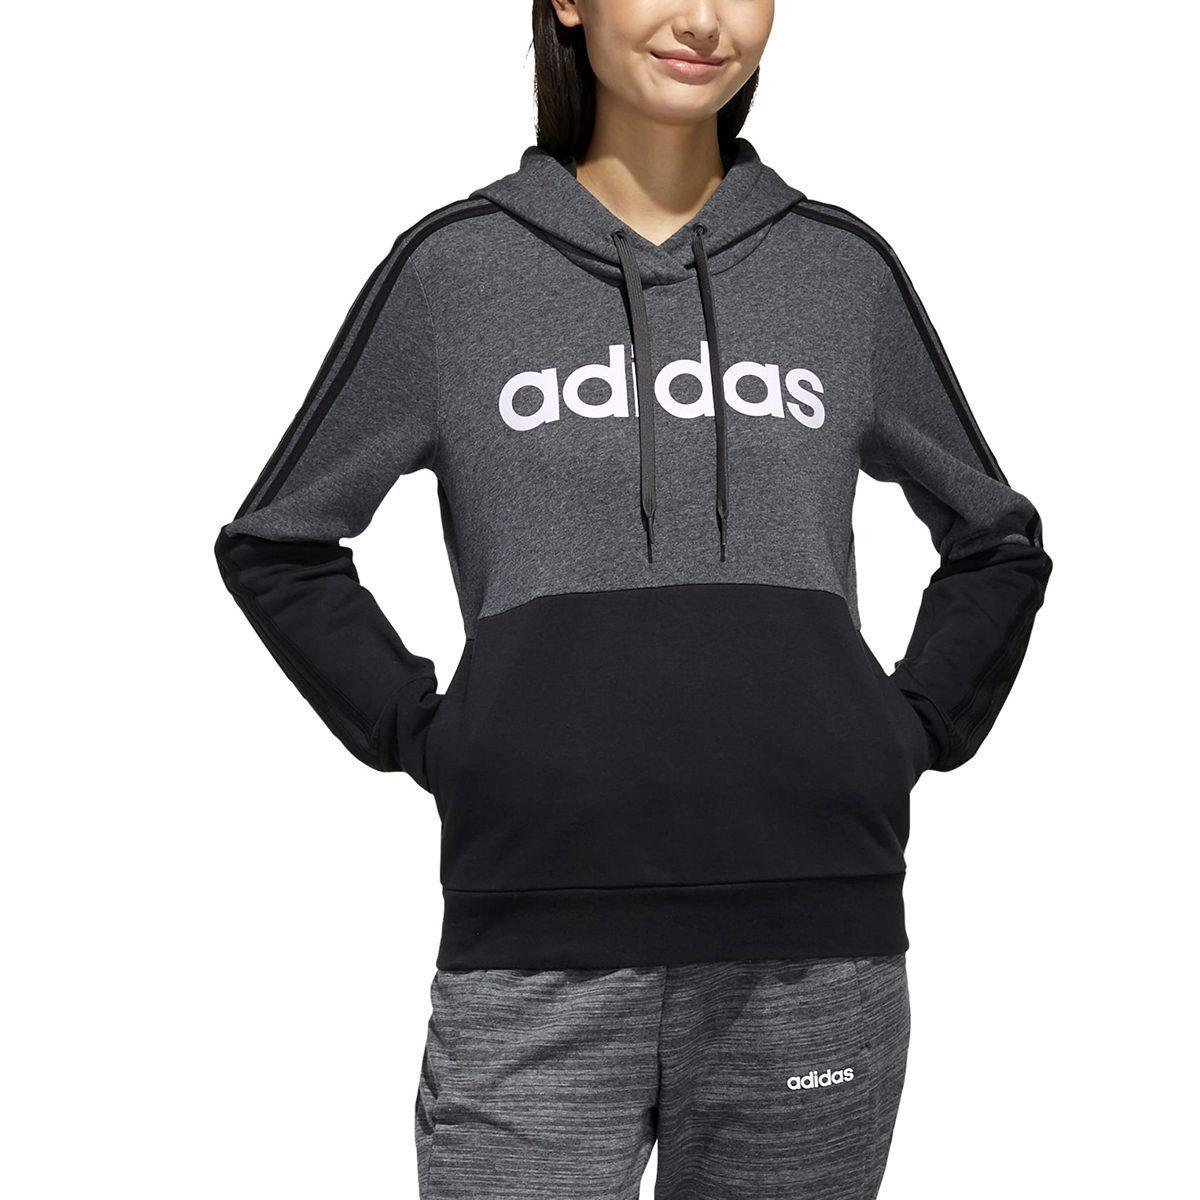 adidas Women/'s Essentials Brand Sweatshirt Choose SZ//Color